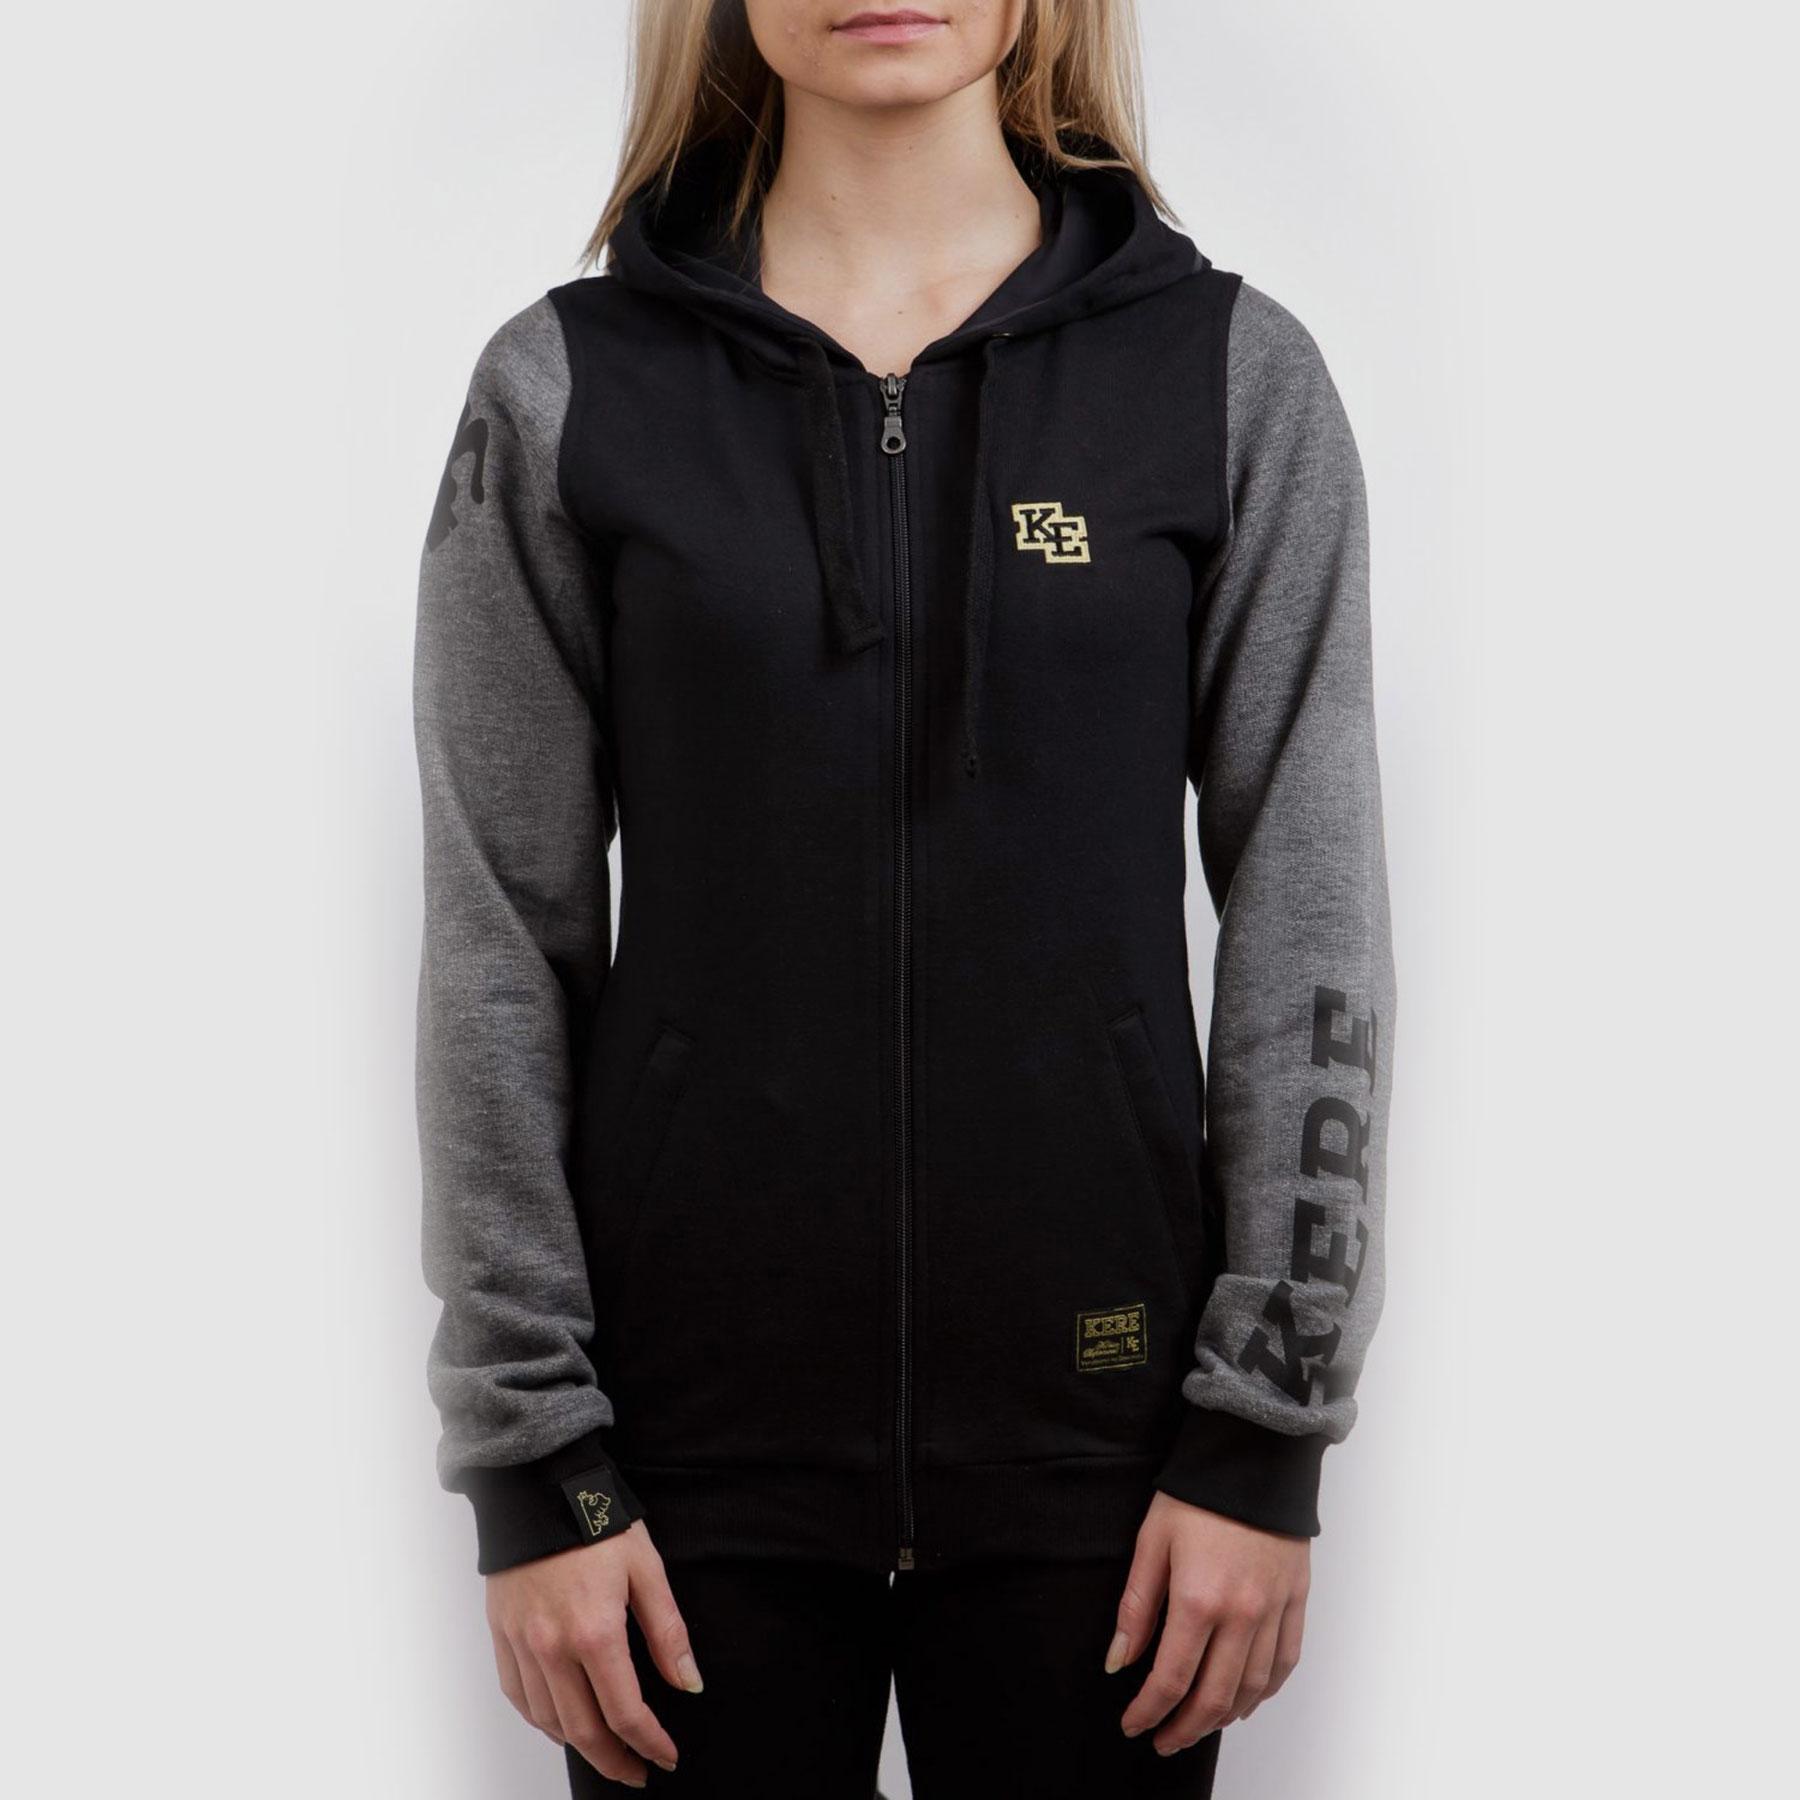 Čierna mikina s kapucňou KERE - KERE 12d41934e51